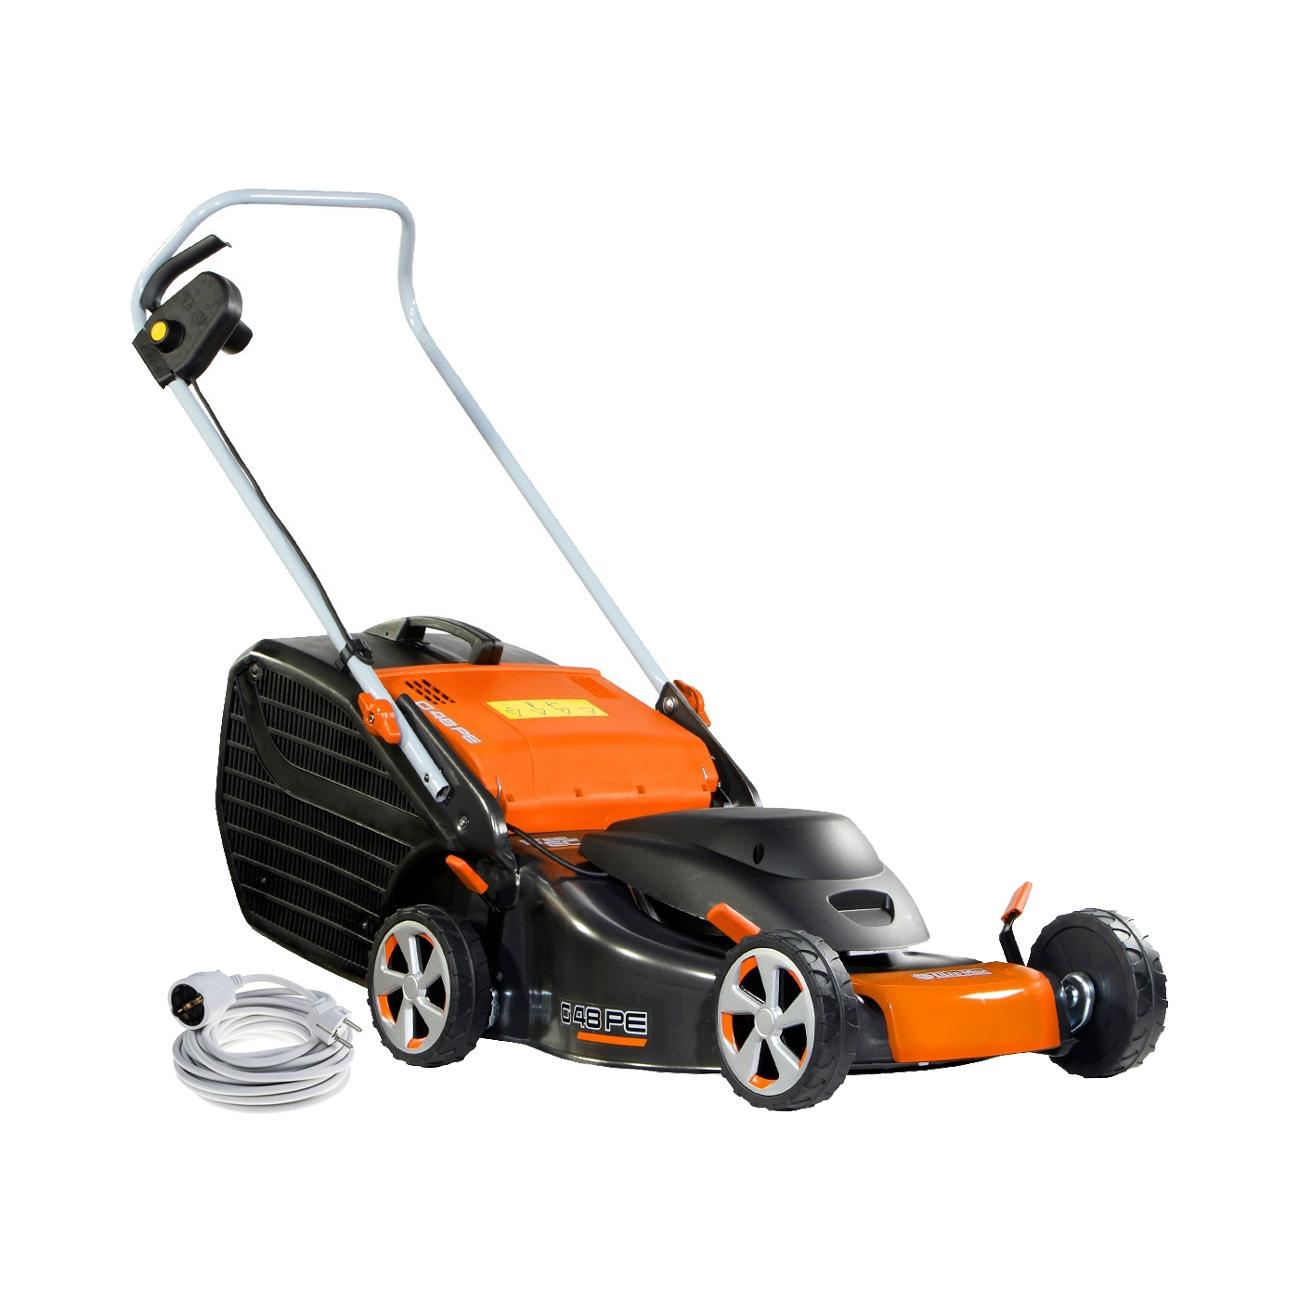 OleoMac G 48 PE Comfort Plus electric lawn mower